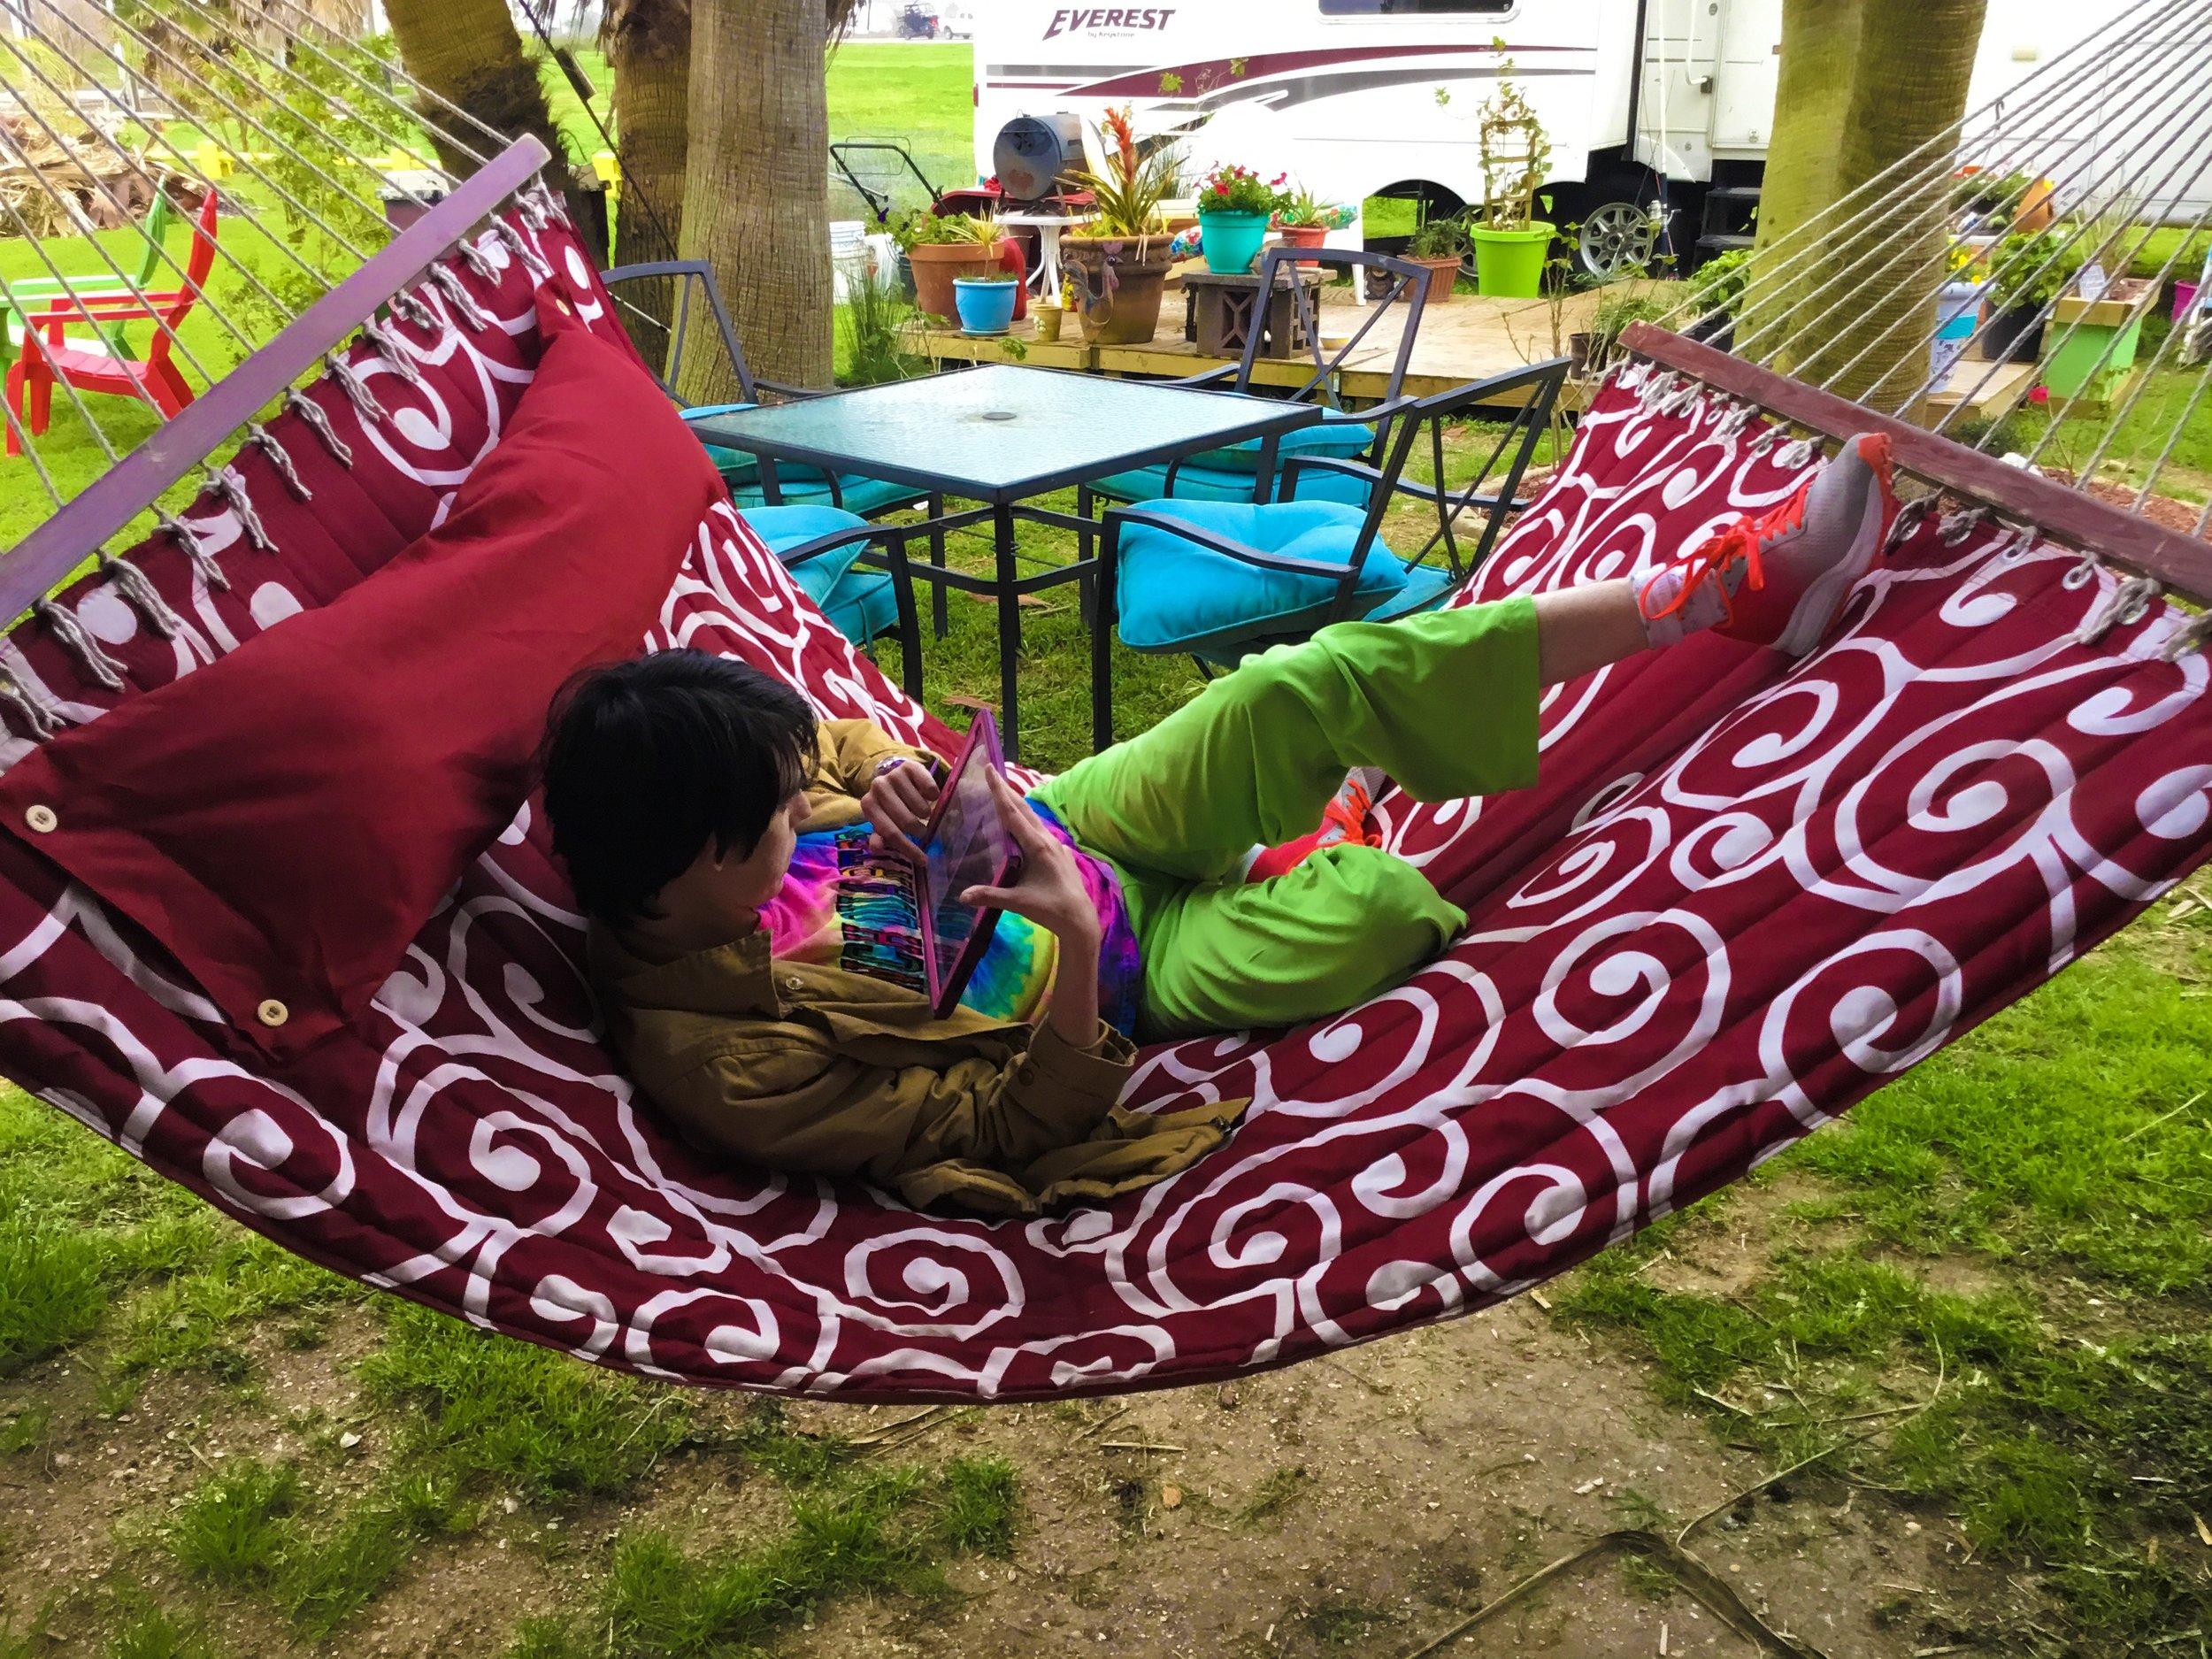 My kiddo enjoying one of the hammocks.